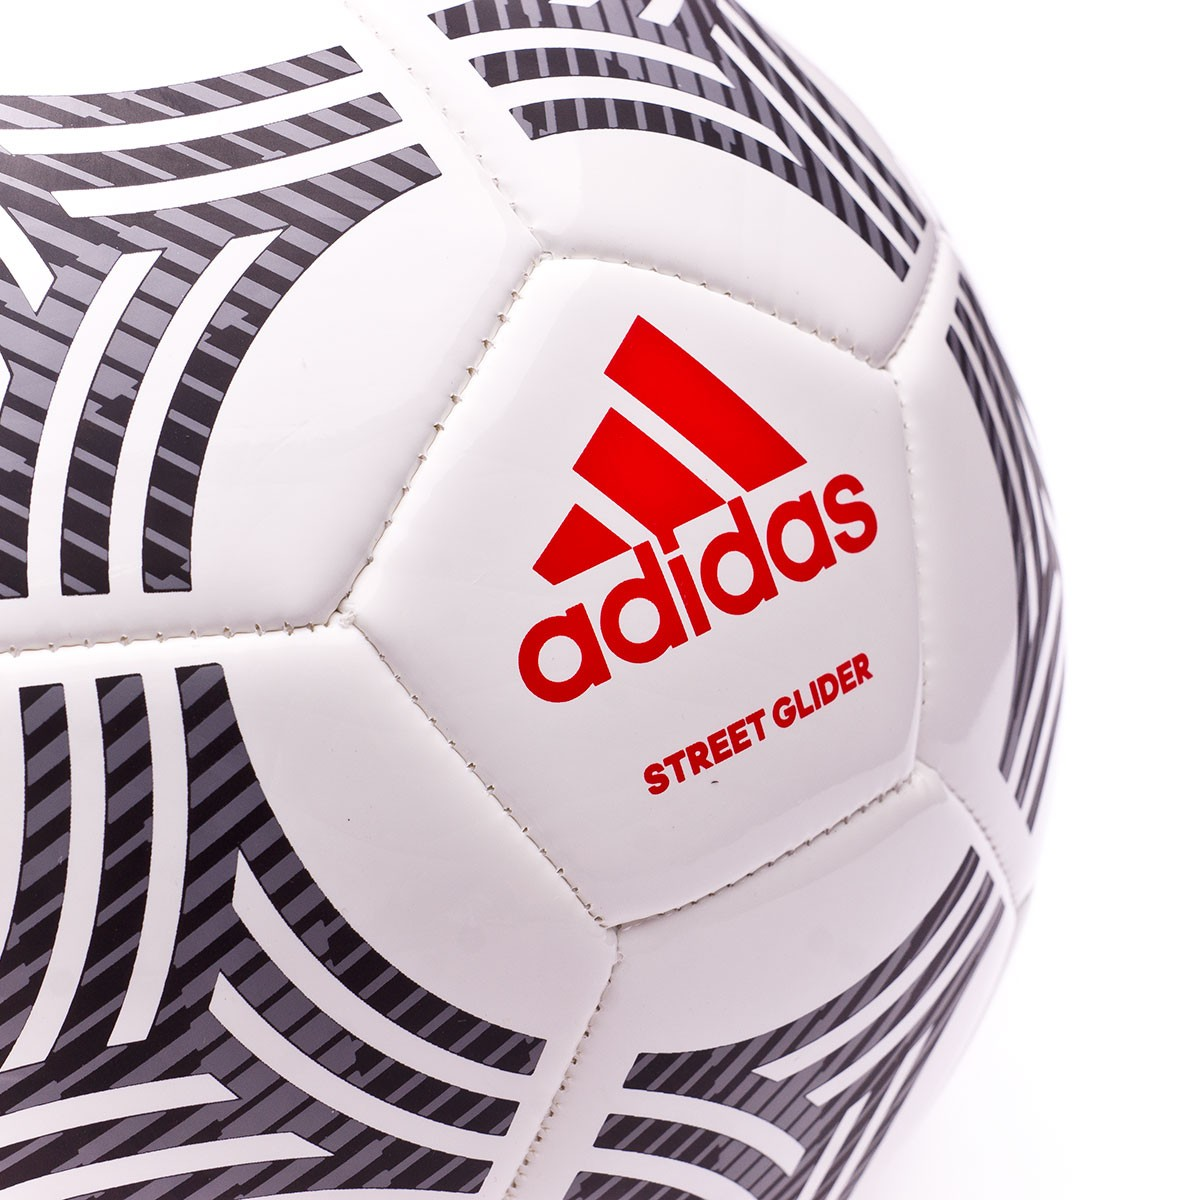 Balón adidas Tango Street Glider White-Black-Real coral - Soloporteros es  ahora Fútbol Emotion 2f26f7ec7b922